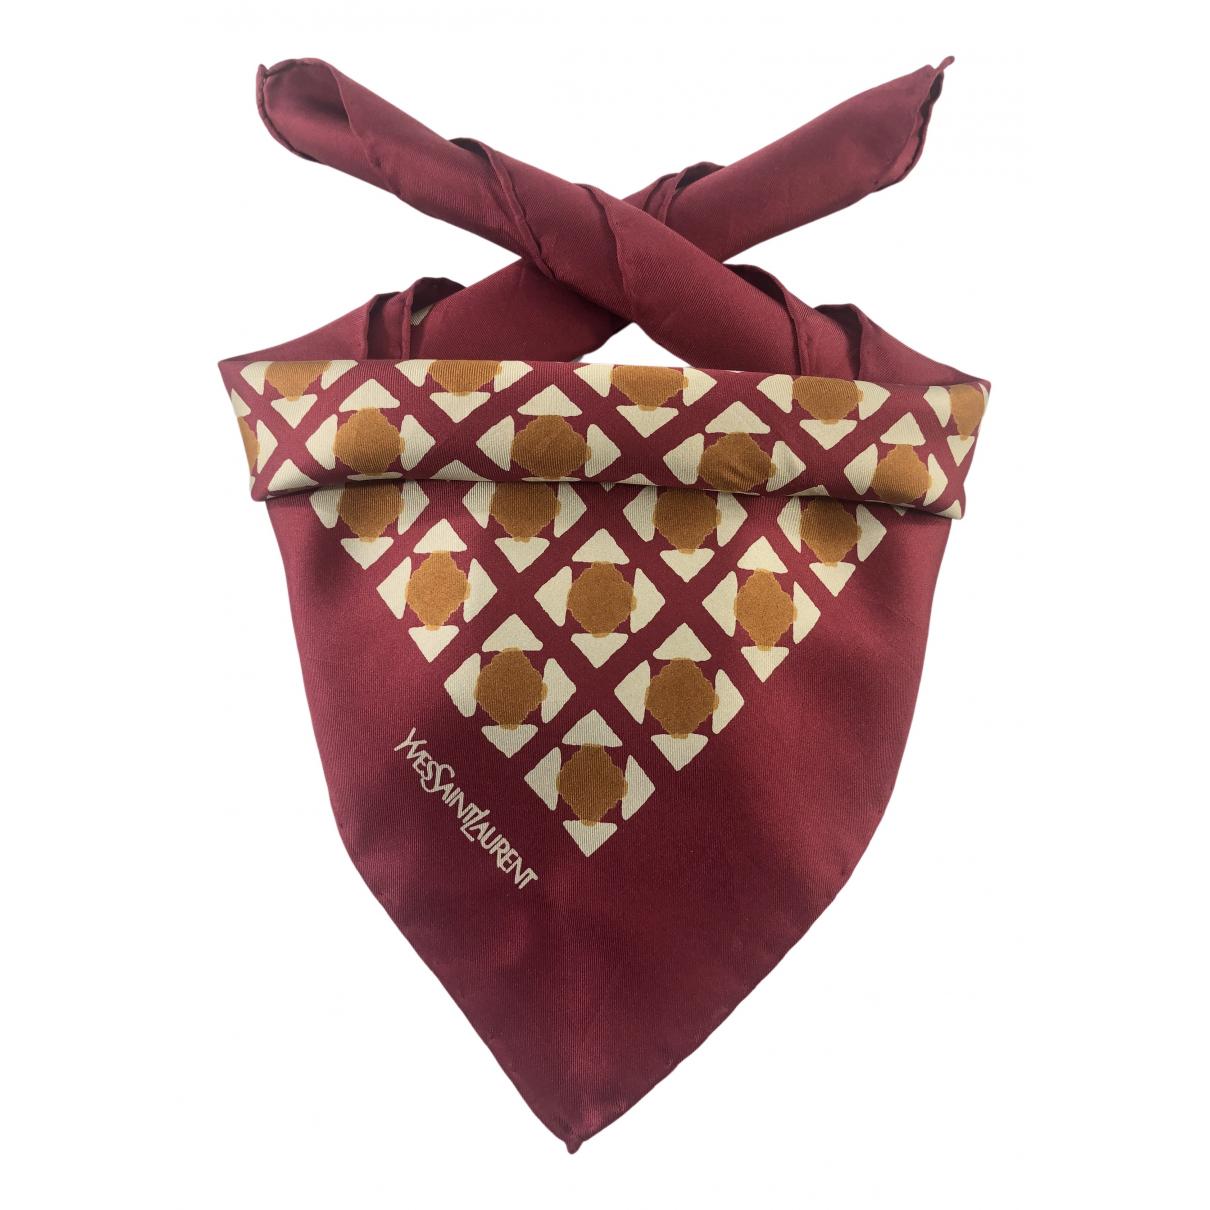 Yves Saint Laurent N Burgundy Silk Silk handkerchief for Women N